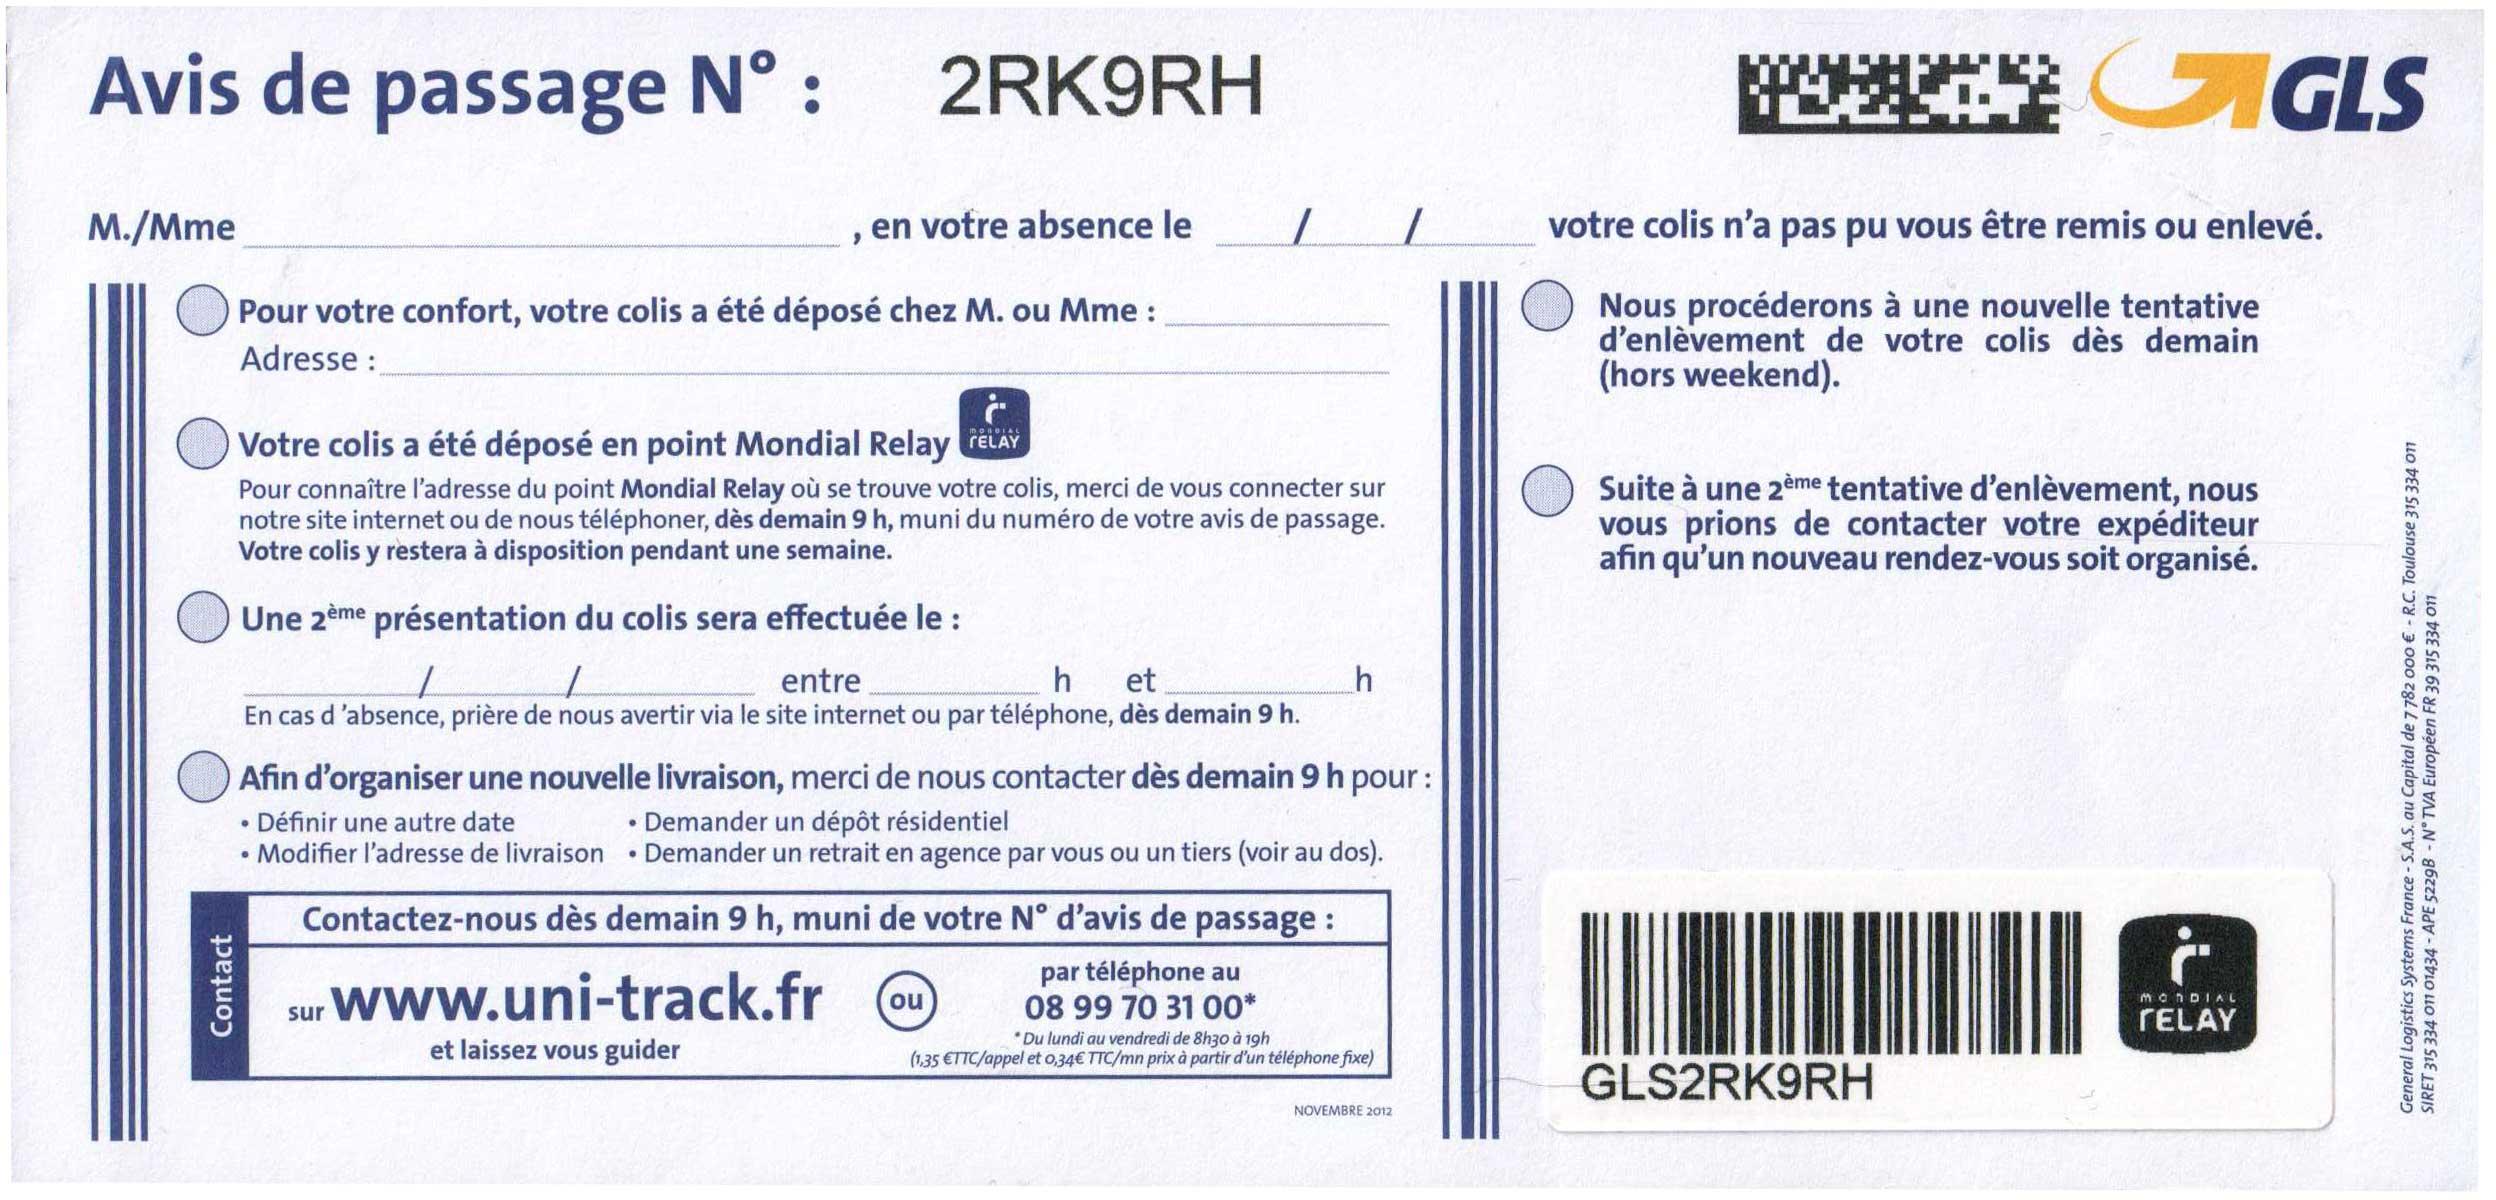 Livraison pharmacie en ligne prado mermoz - Agence livraison mondial relay ...